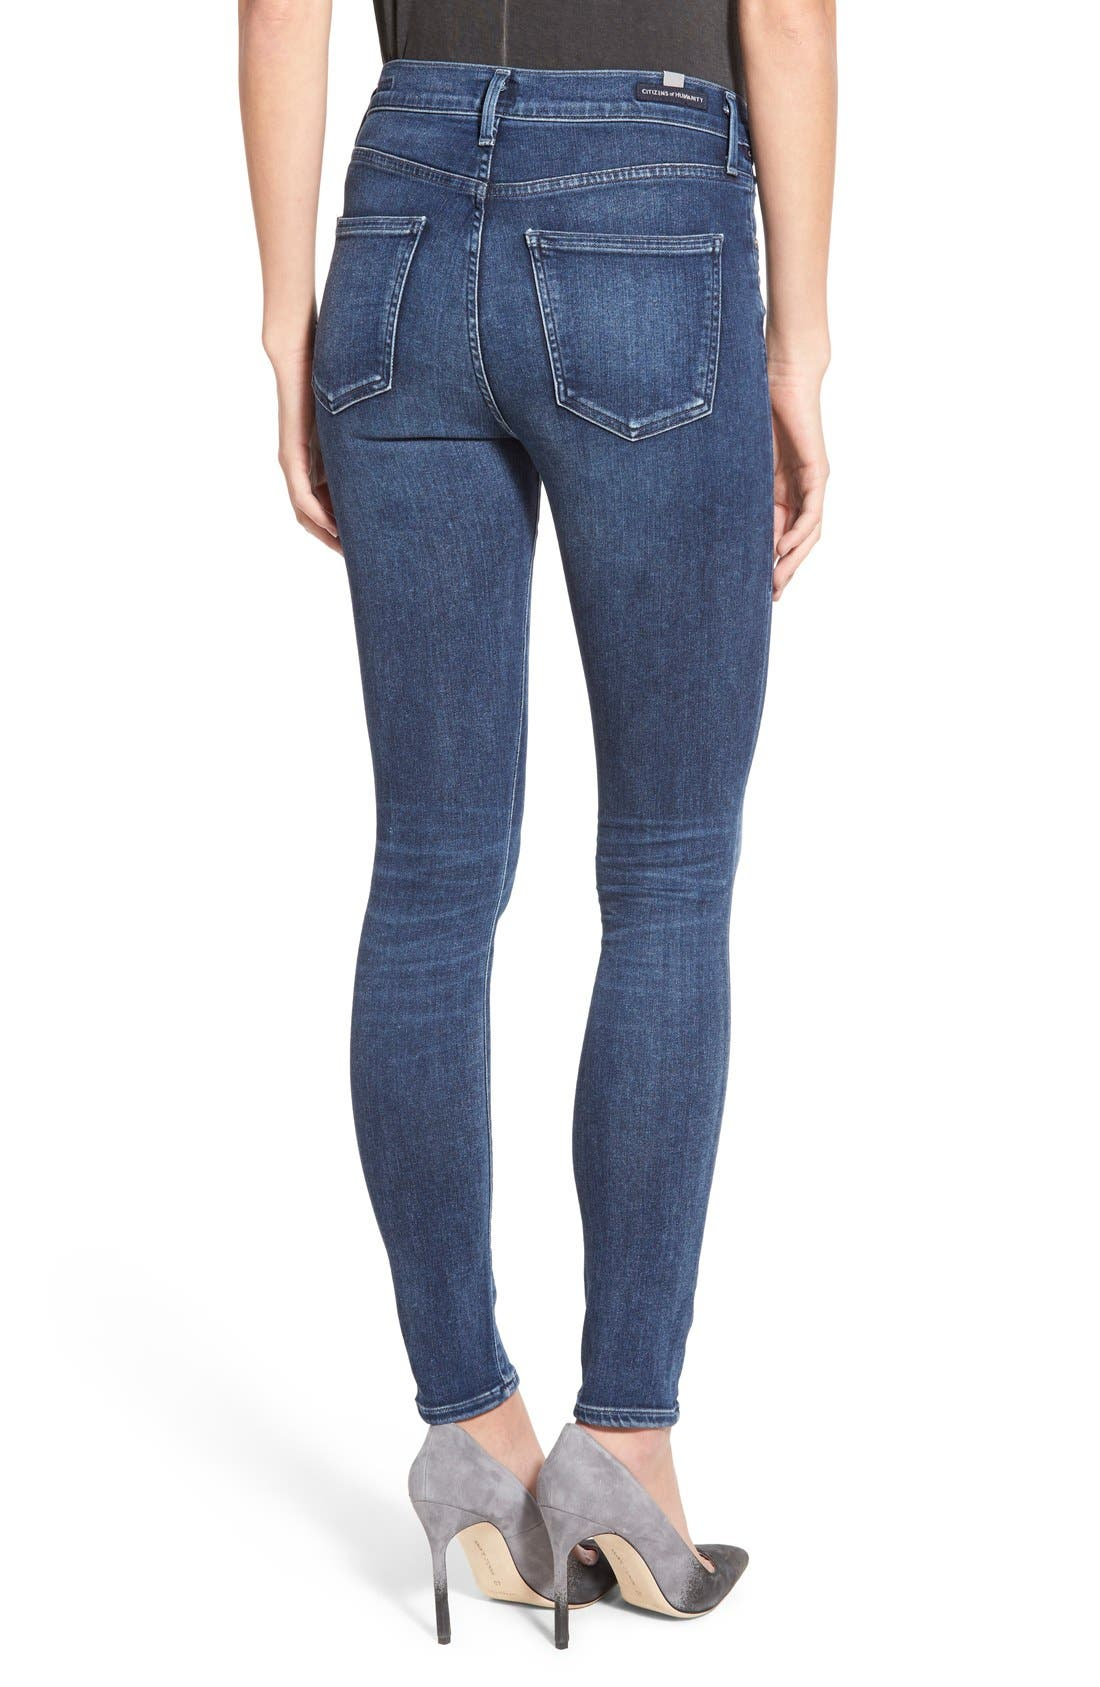 Sculpt - Rocket High Waist Skinny Jeans,                             Alternate thumbnail 6, color,                             WAVERLY